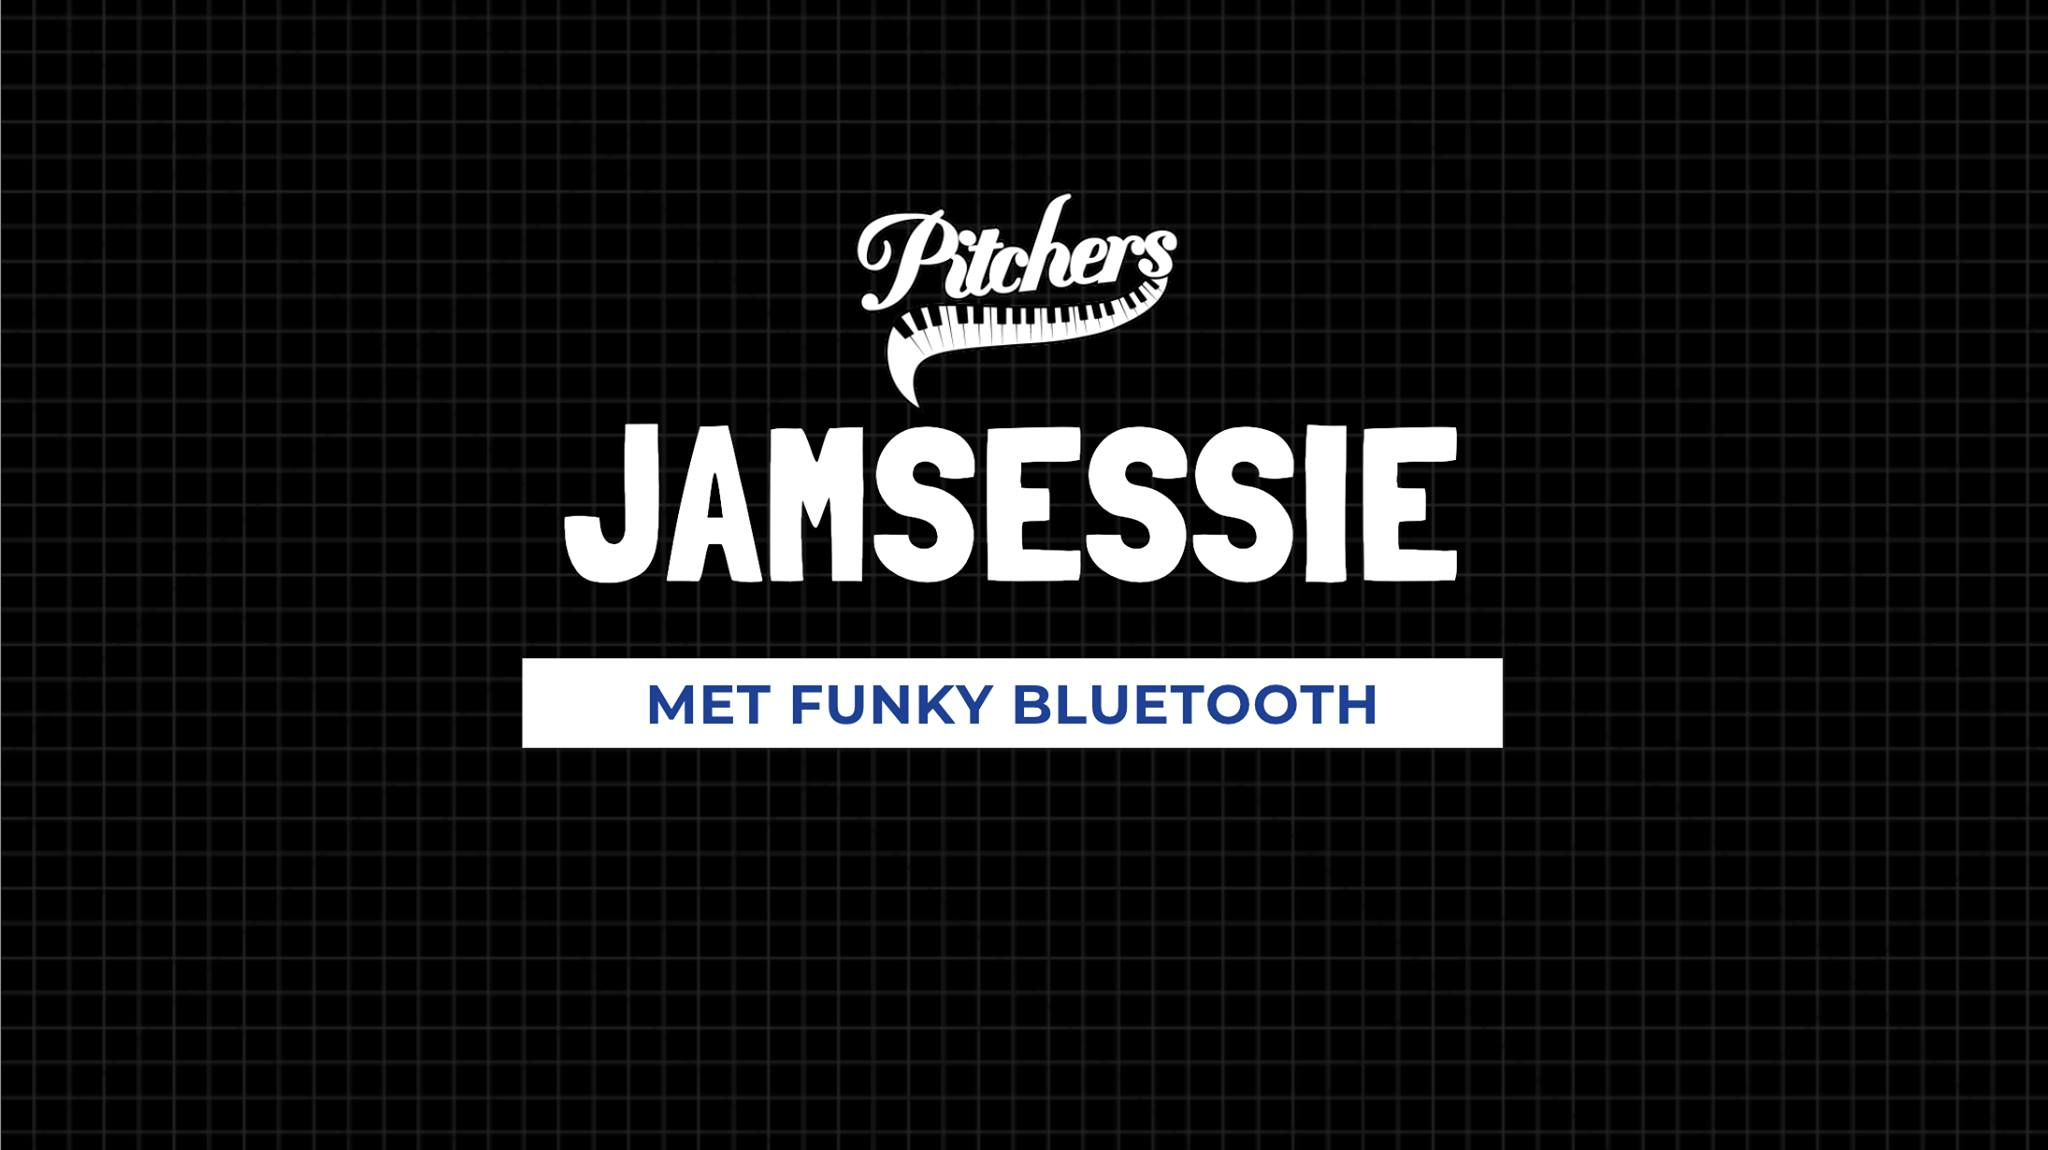 Jamsessie Funky Bluetooth @ Pitchers